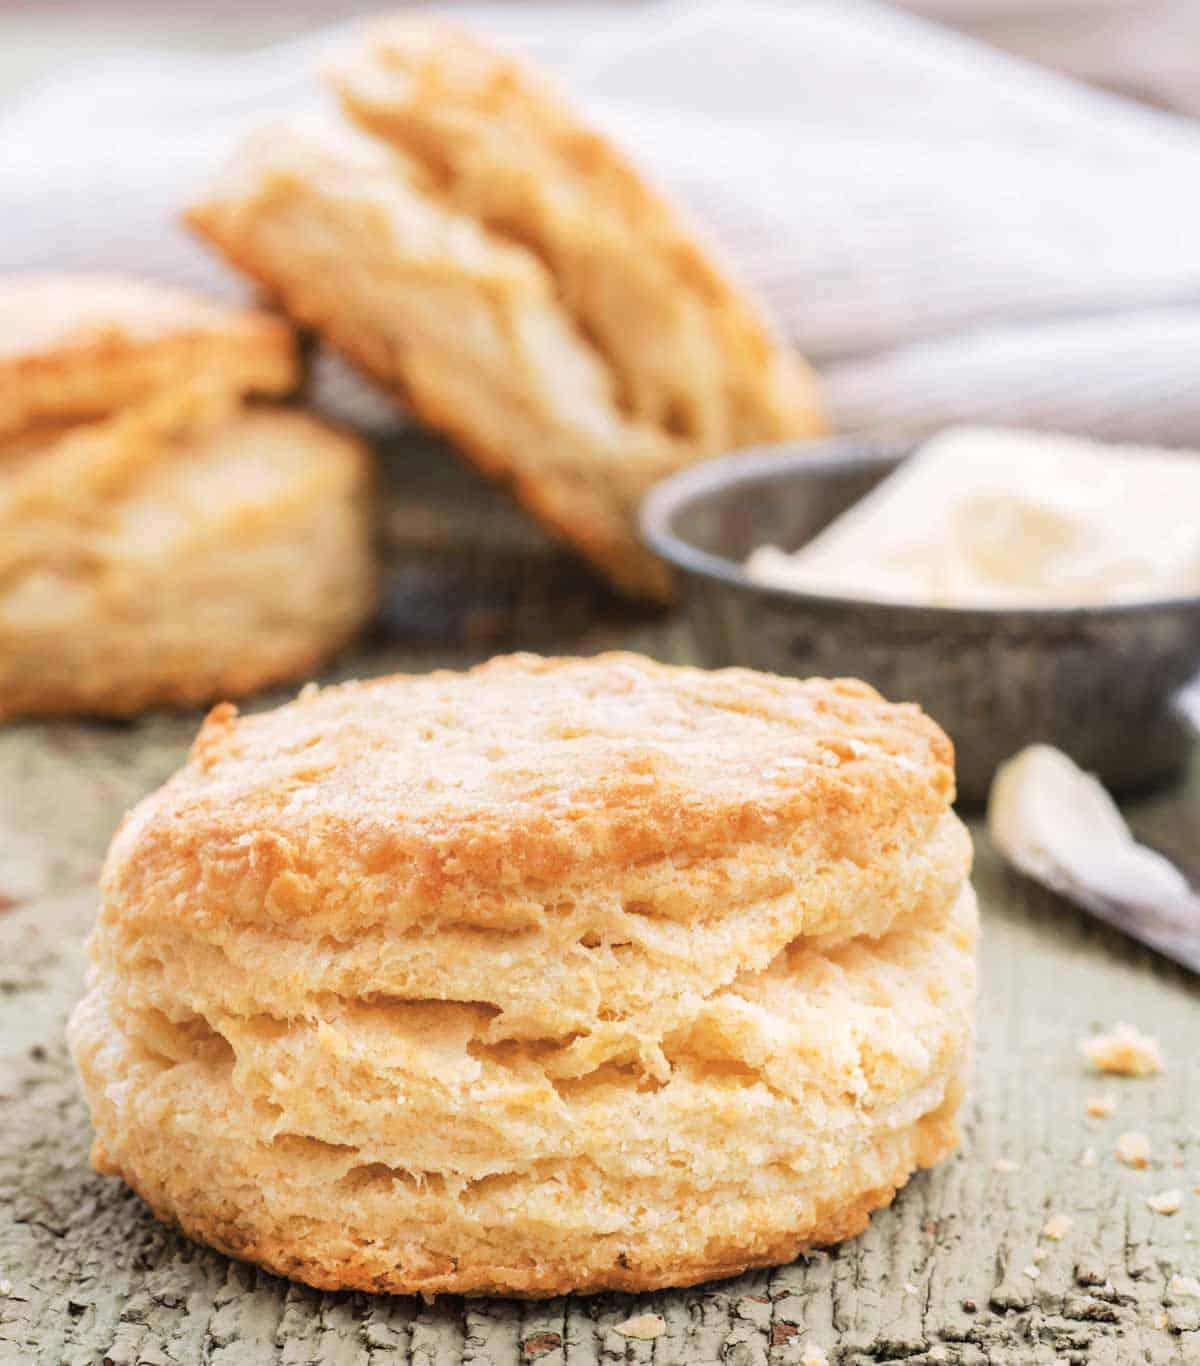 Biscuit recipe from Jessica's cookbook